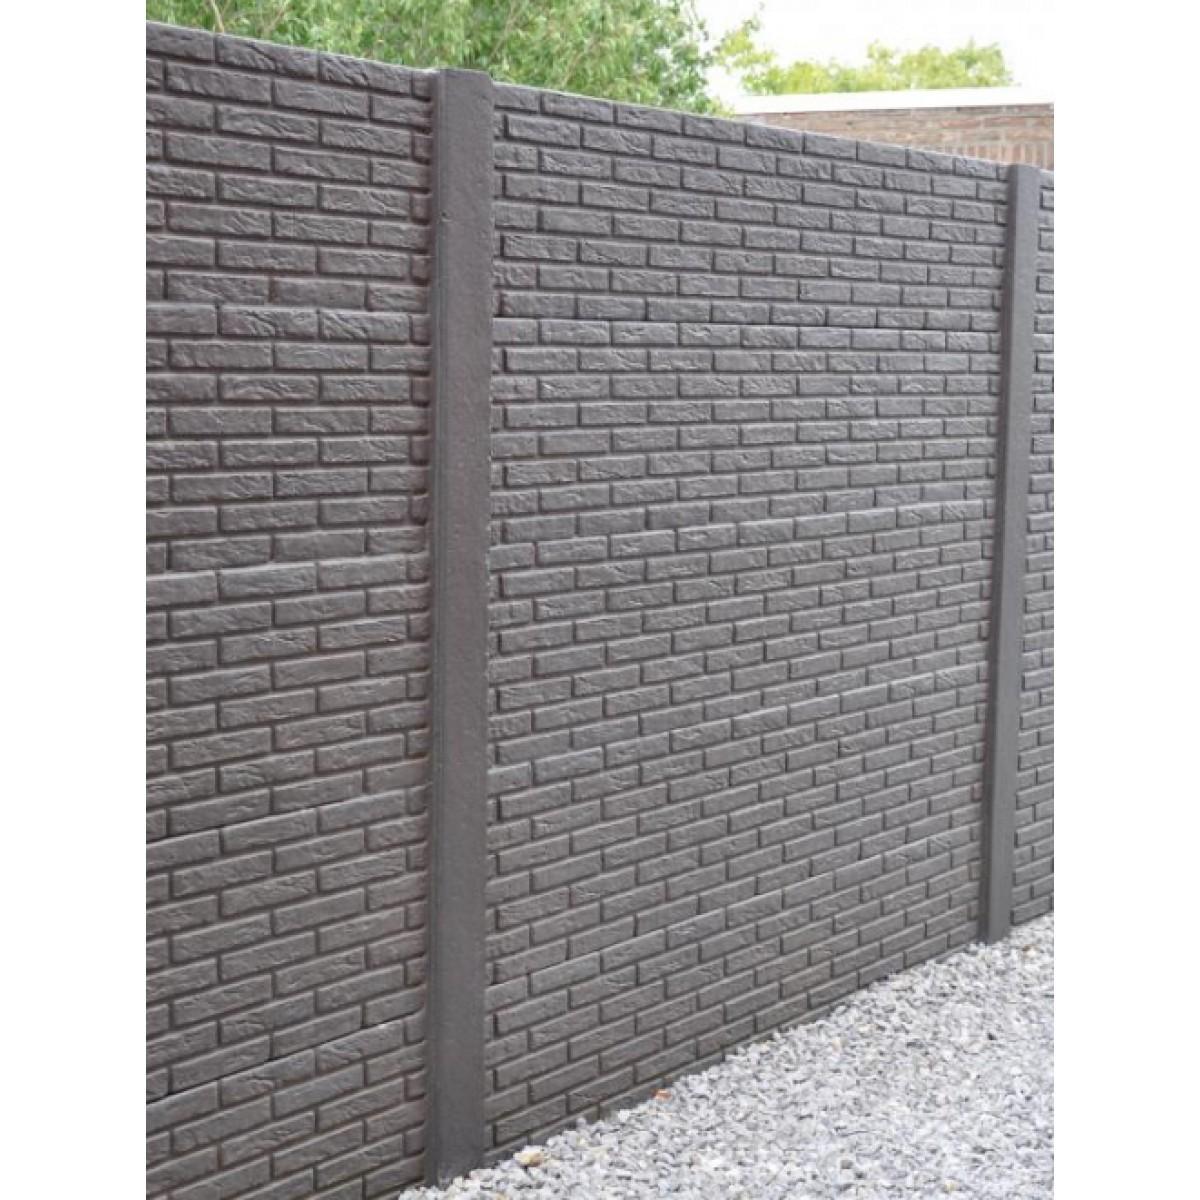 Schuttingen beton bij Schutting33